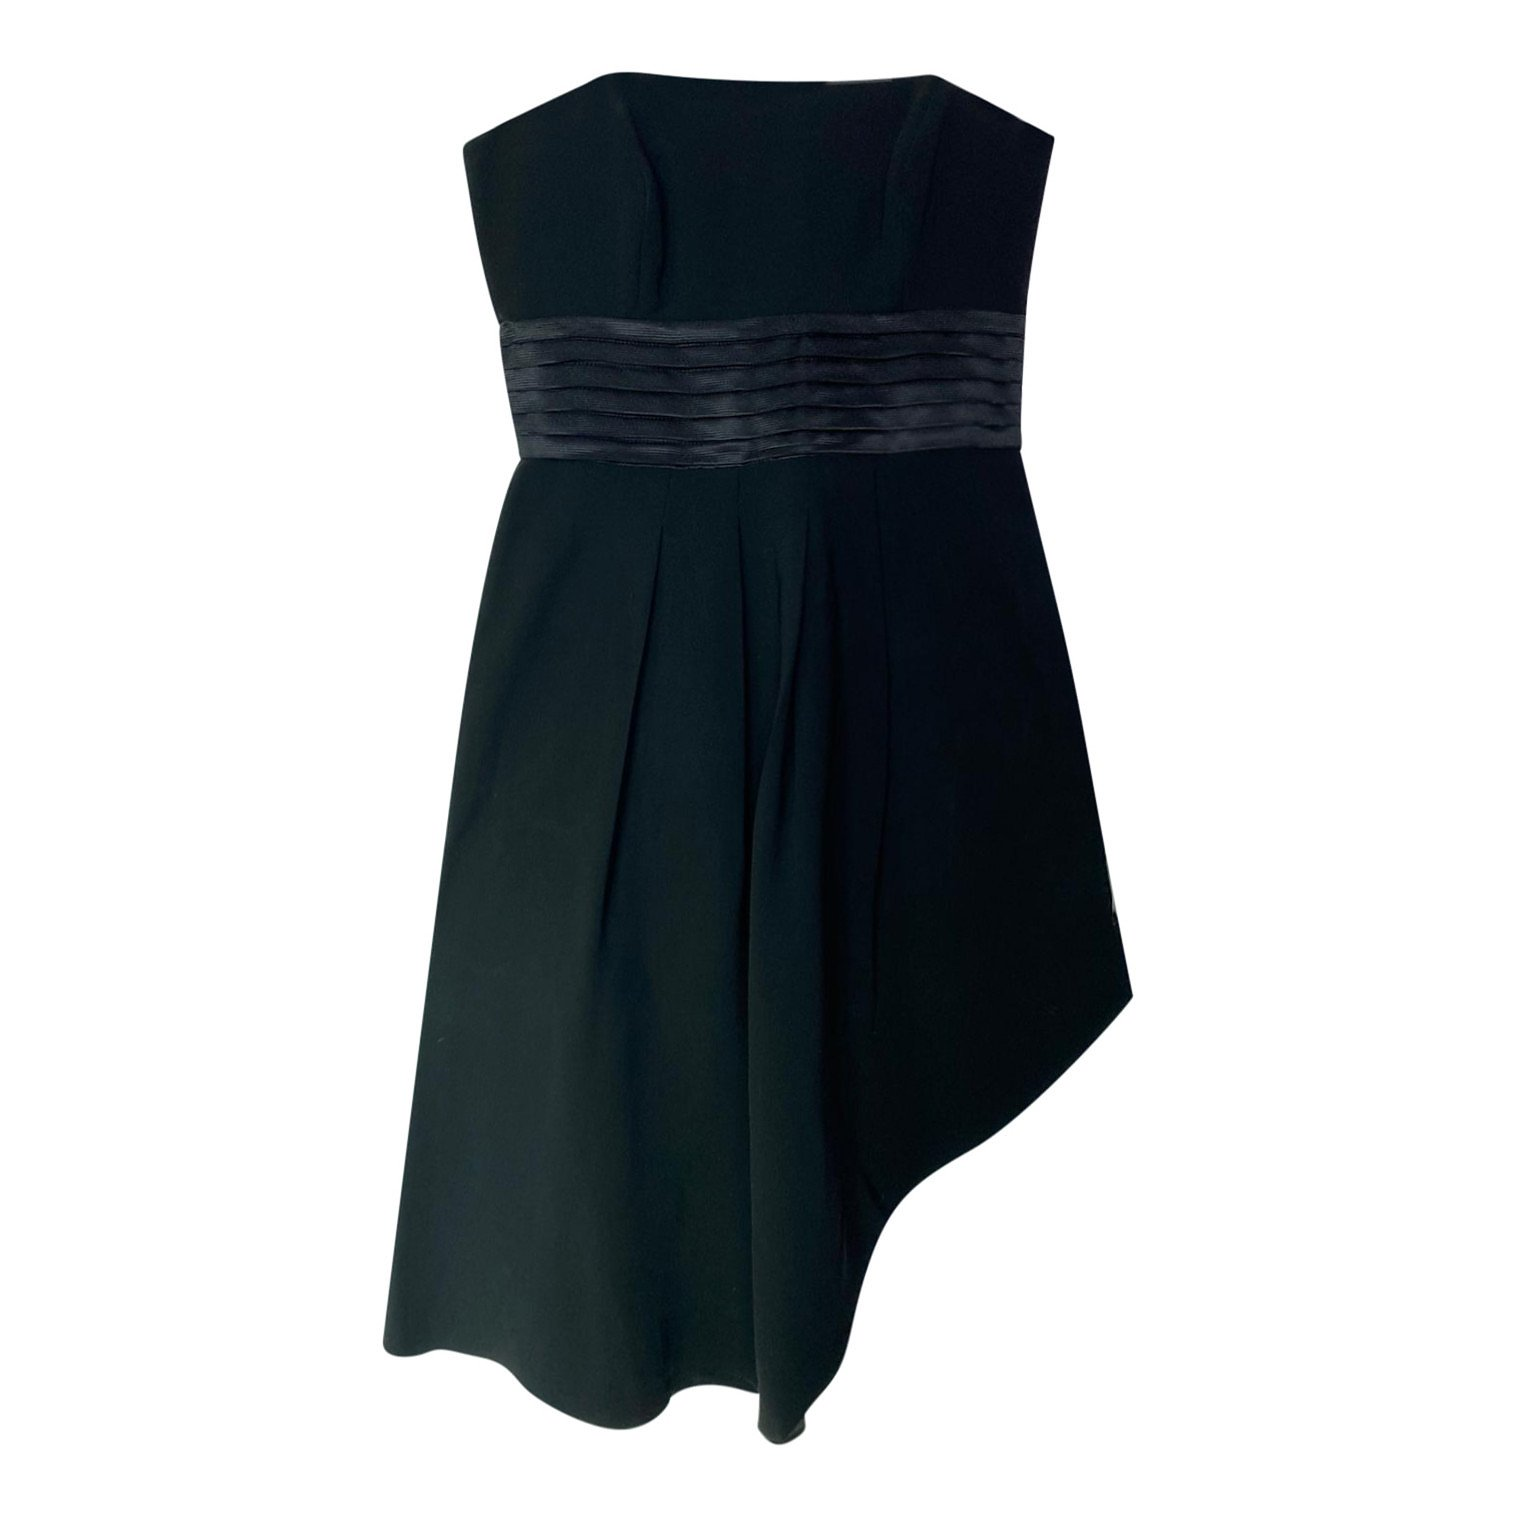 Sportmax Code Asymmetrical Corset Dress